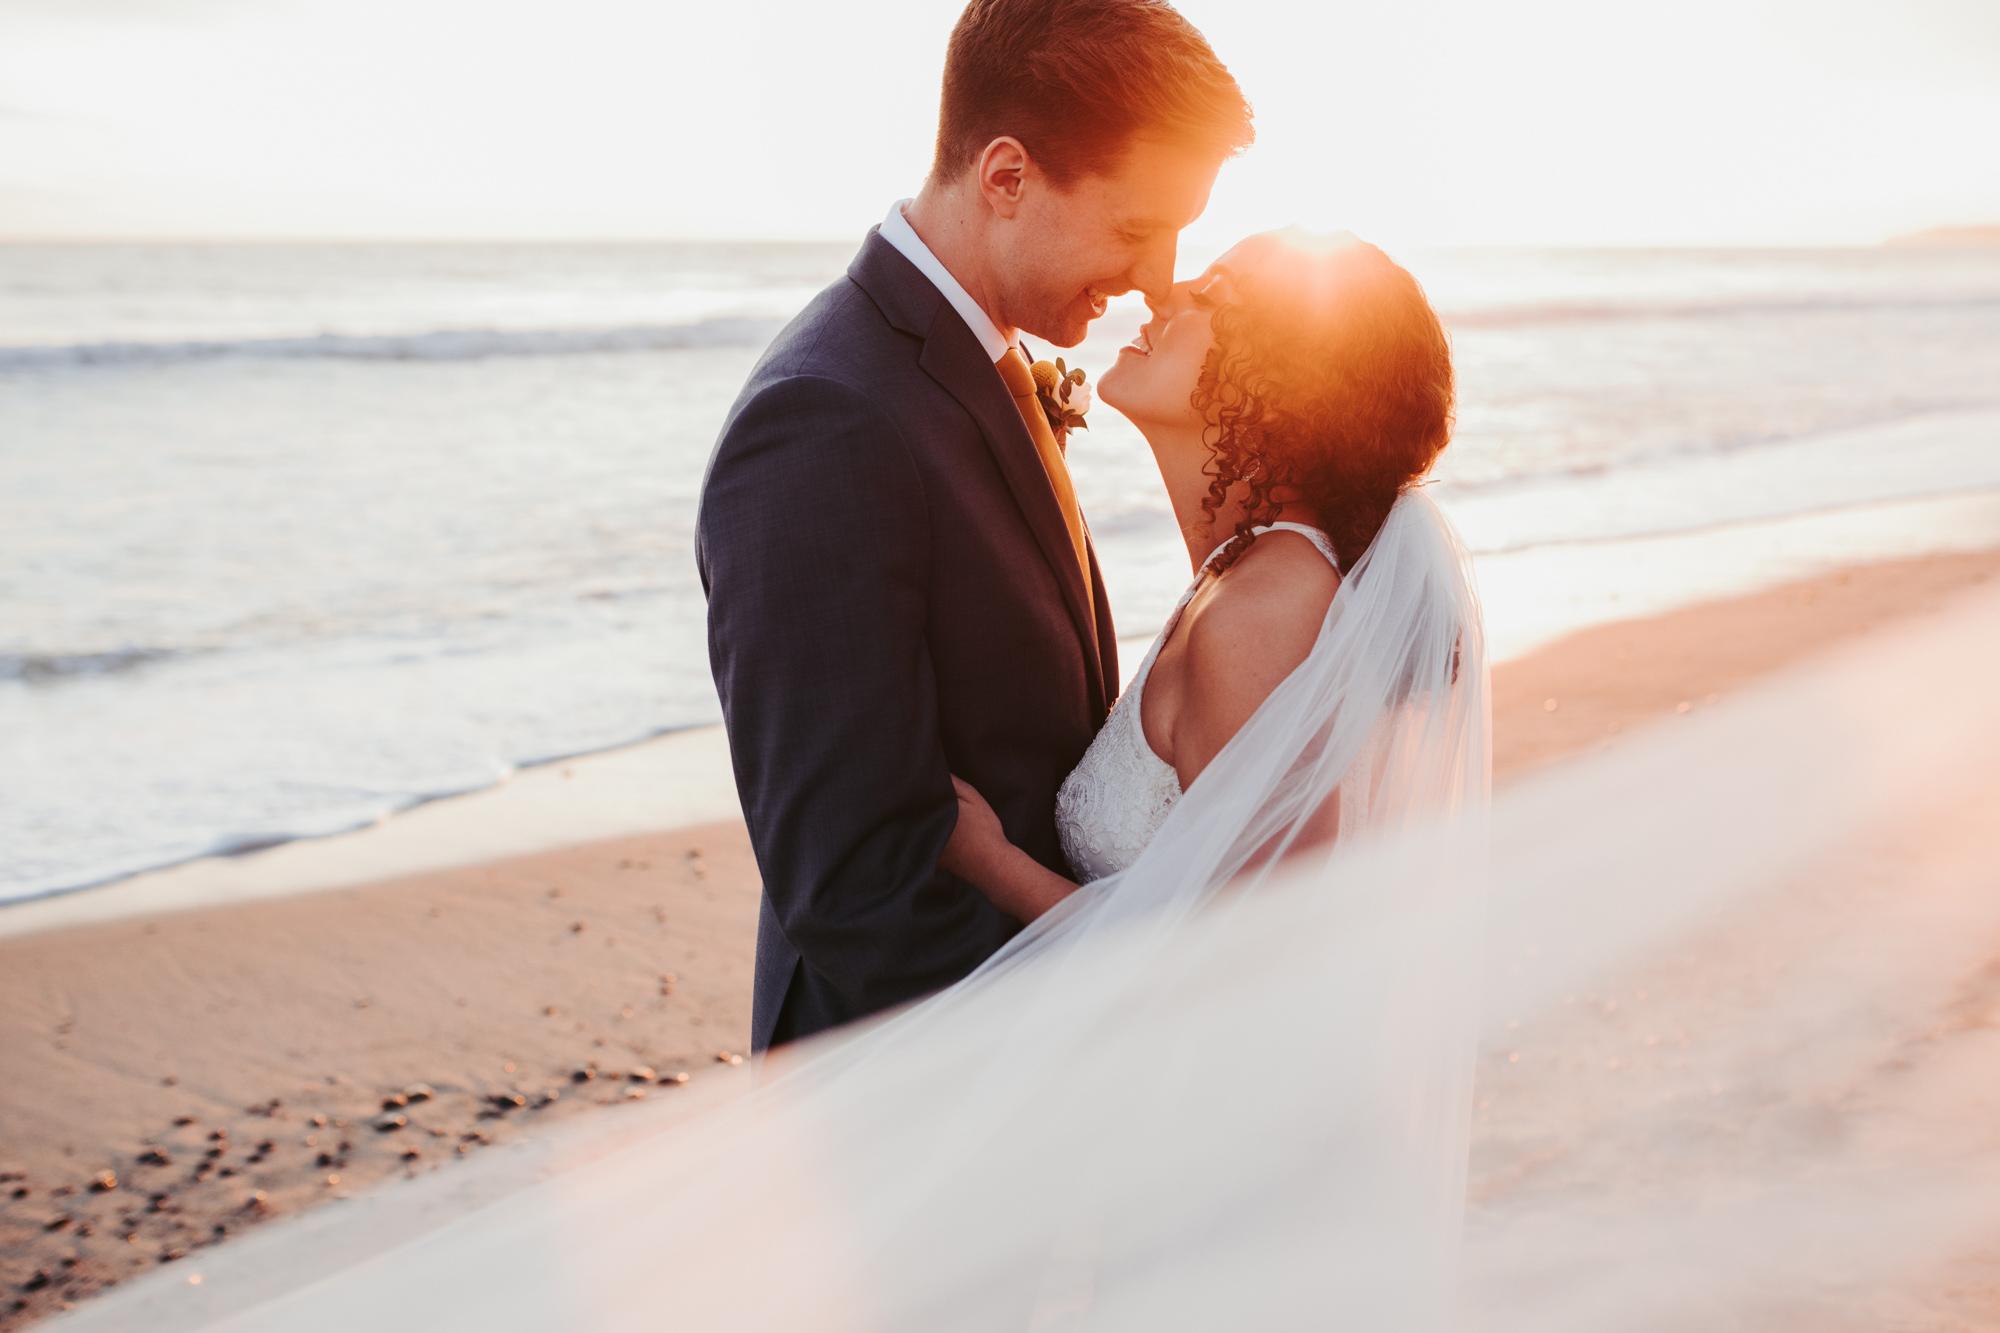 133-destination-wedding-san-clemente-california.jpg